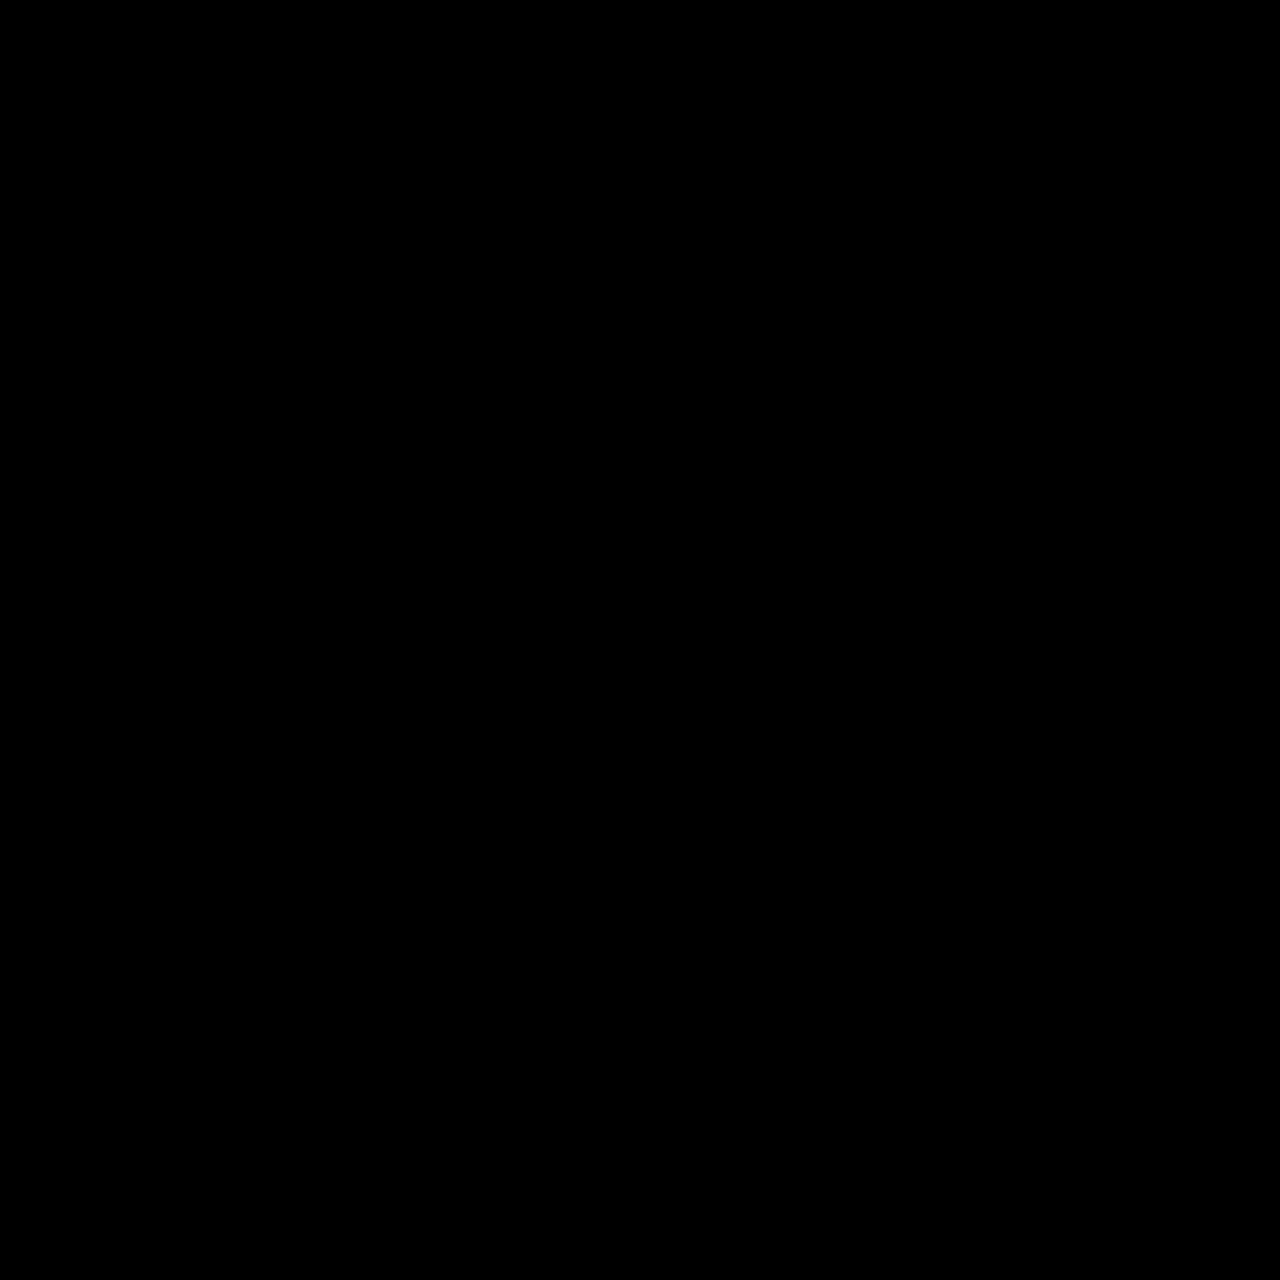 versatility-black-50x50